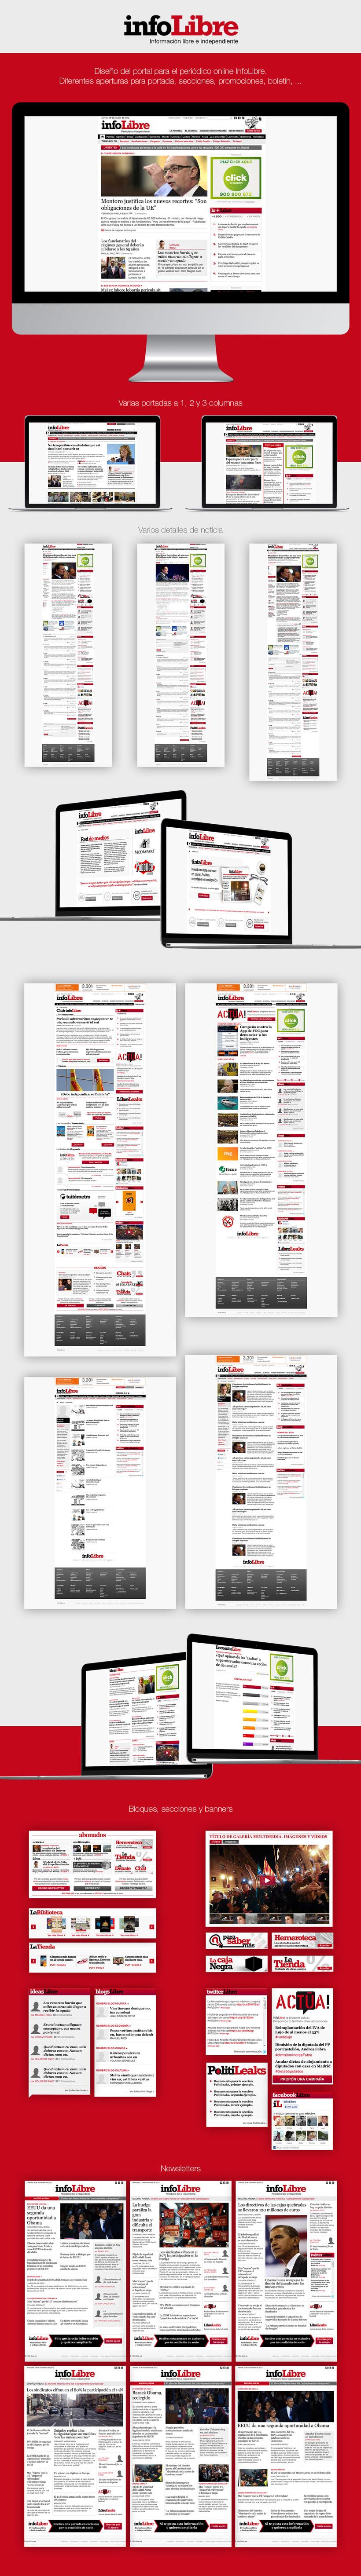 InfoLibre | Online newspaper -1